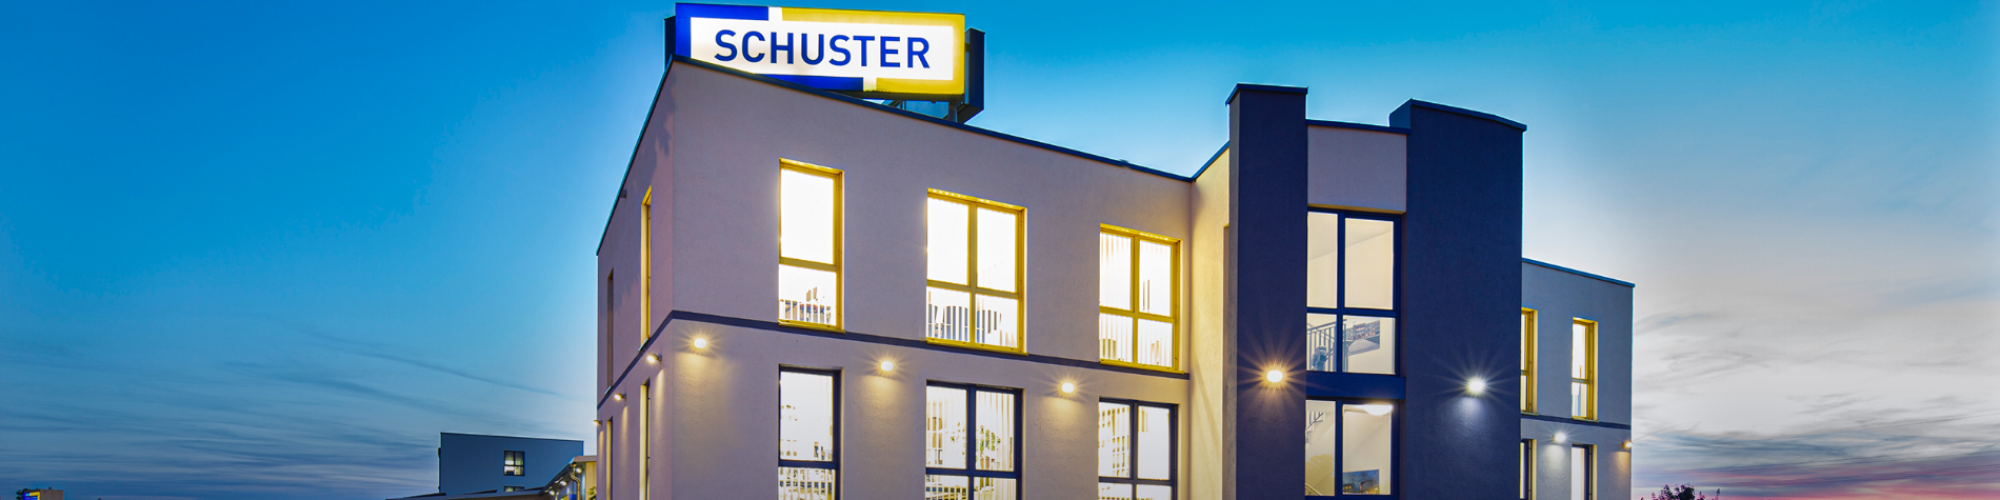 Schuster Klima Lüftung GmbH & Co. KG